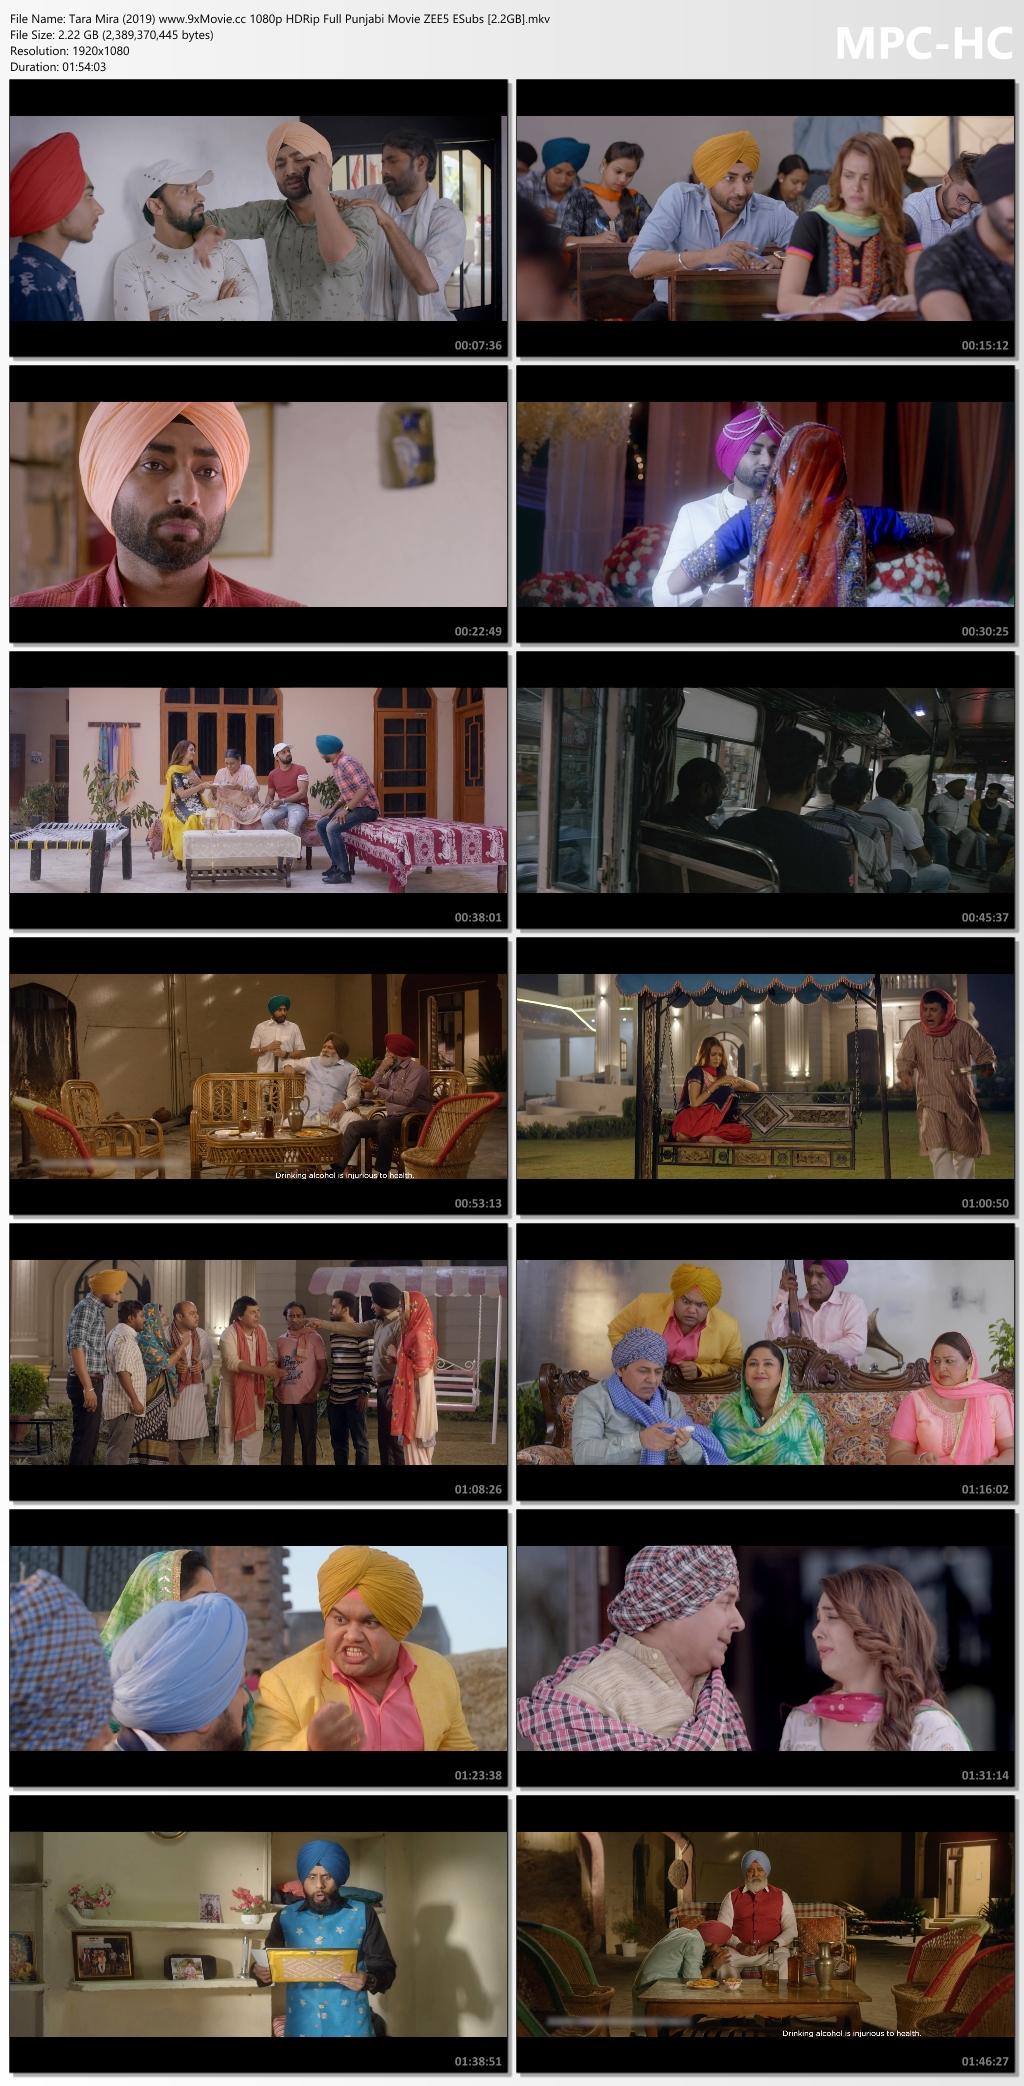 Tara-Mira-2019-www-9x-Movie-cc-1080p-HDRip-Full-Punjabi-Movie-ZEE5-ESubs-2-2-GB-mkv